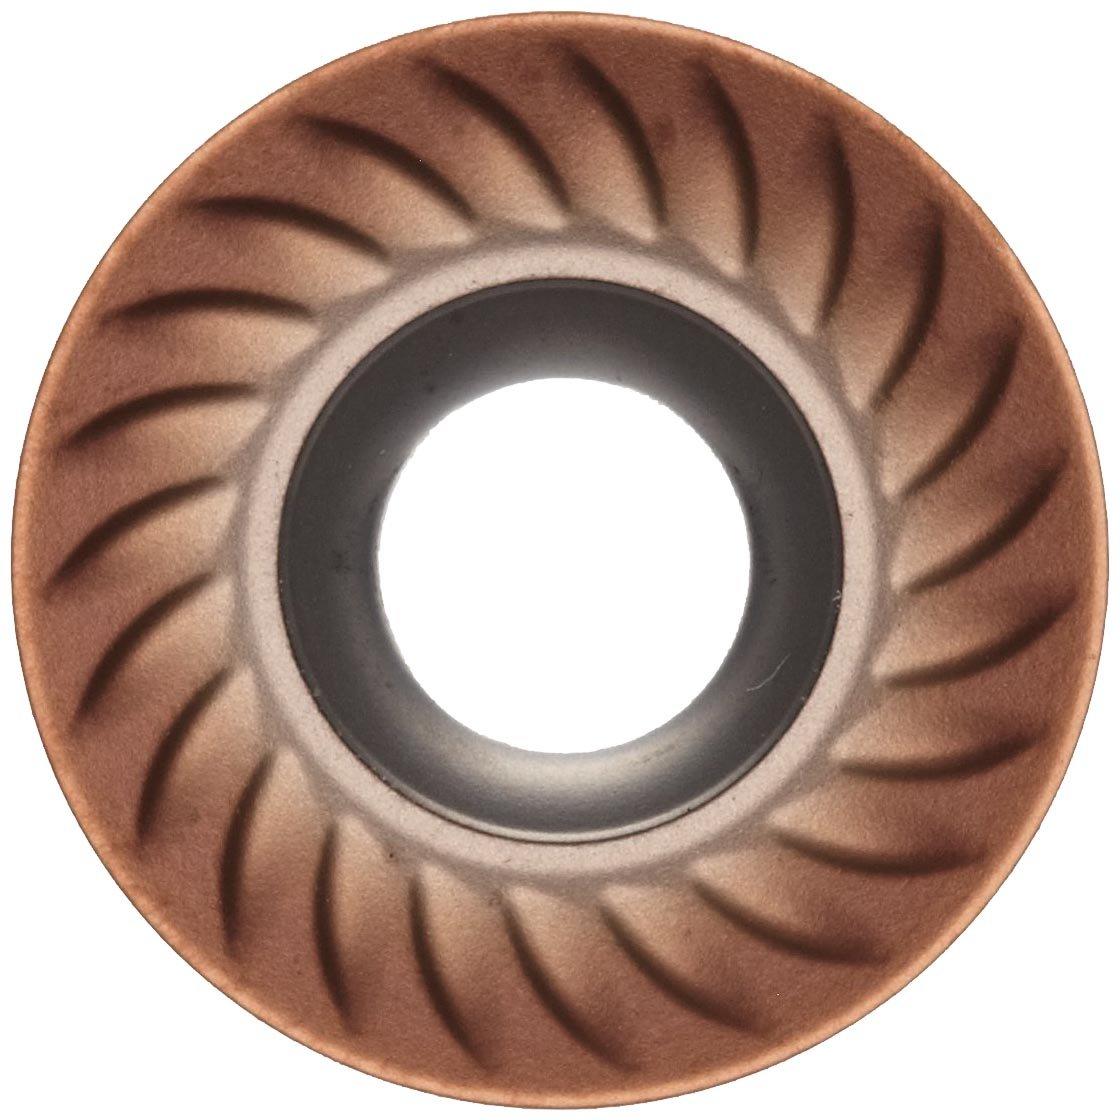 Buy Sandvik Coromant COROMILL Carbide Milling Insert, R390 Style